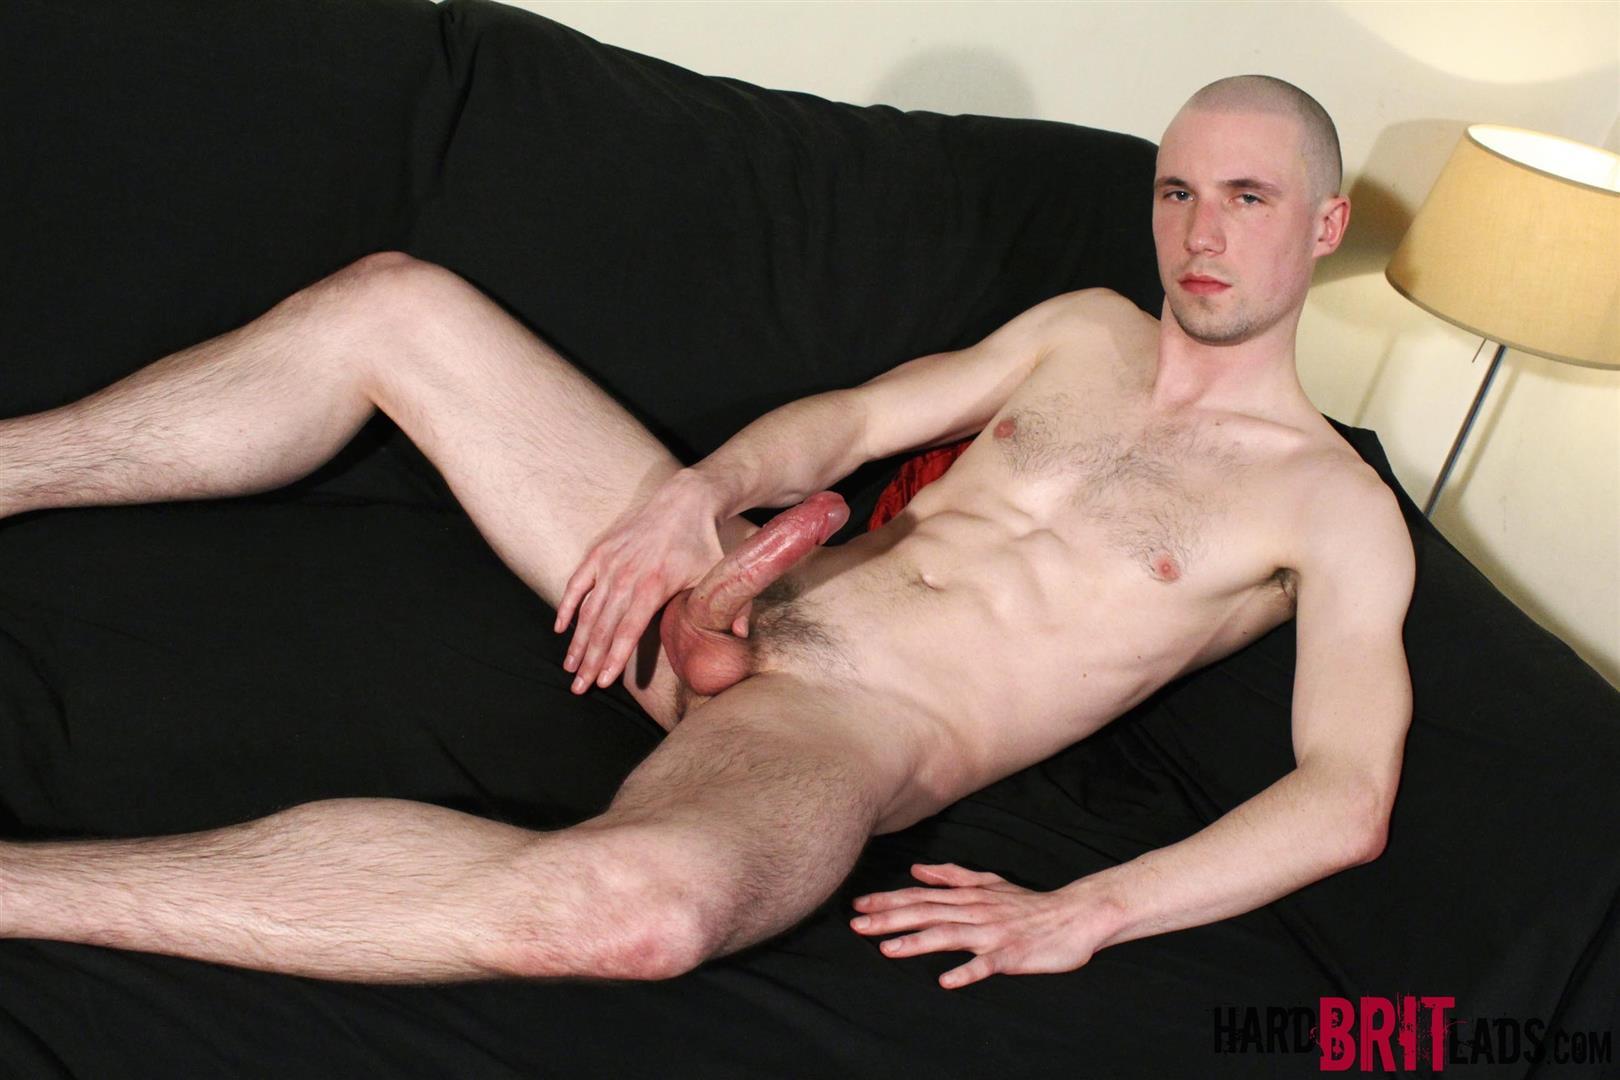 Hard Brit Lads Jason Domino Naked Skinhead With Big Uncut Cock Jerk Off Amateur Gay Porn 08 British Skinhead Jerking Off His Big Uncut Cock